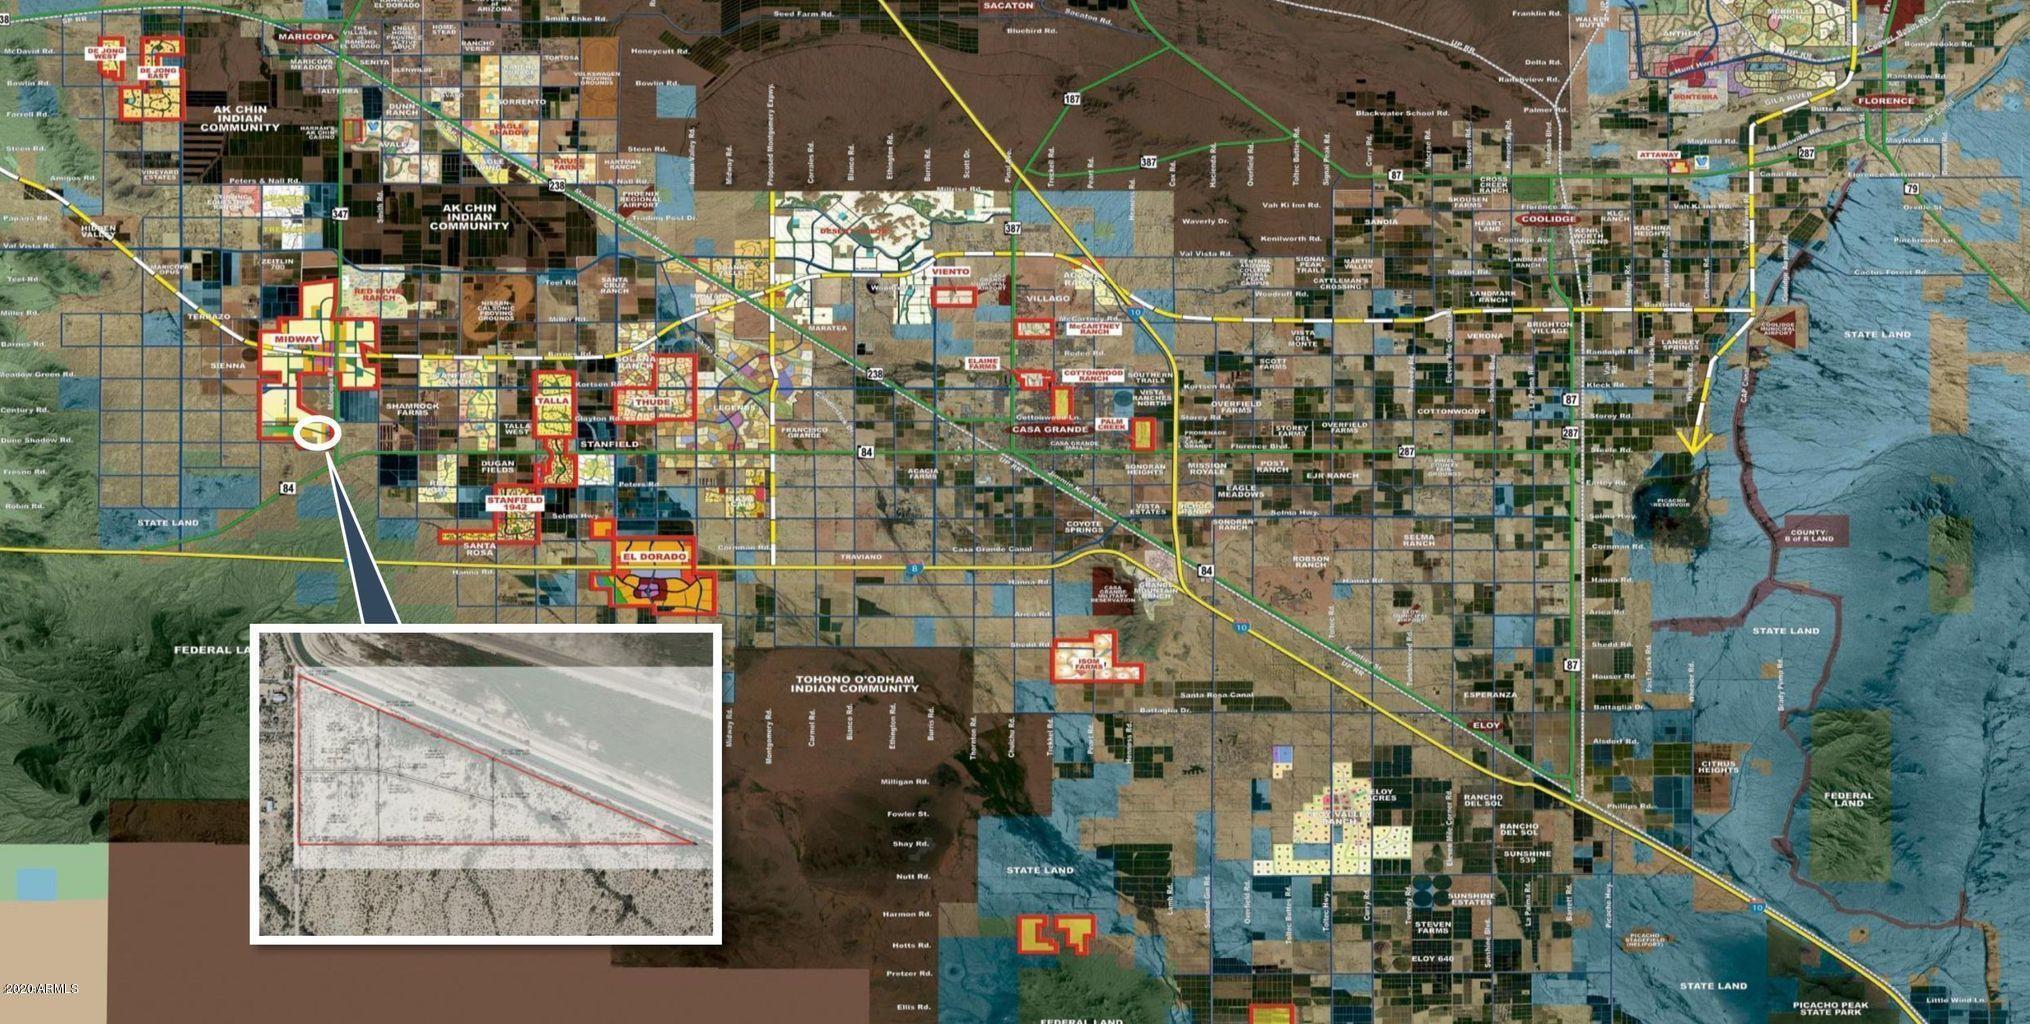 0 N Green Rd C --, Maricopa, AZ 85139, ,Land,For Sale,0 N Green Rd C --,6169405